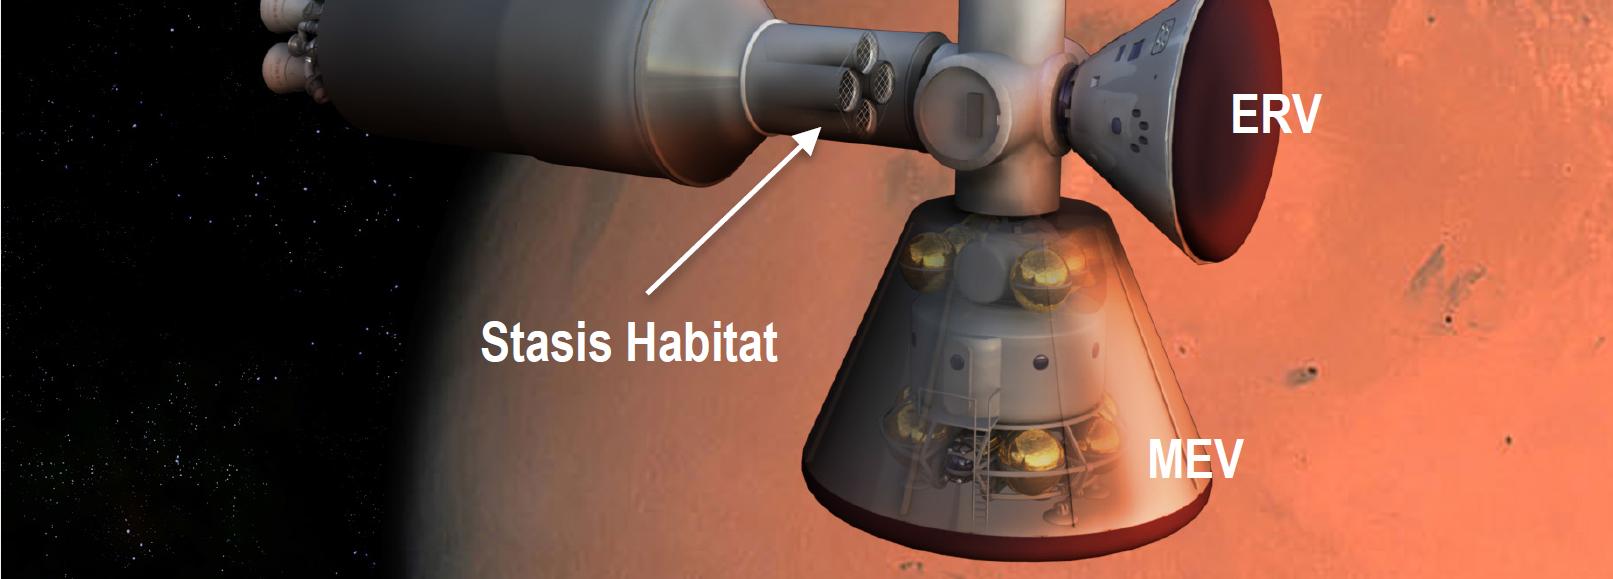 Mars Transfer Vehicle